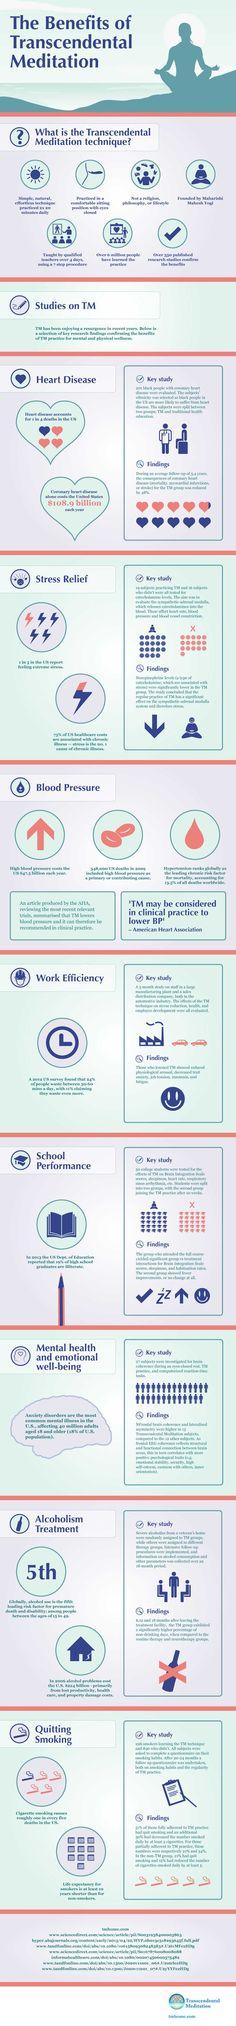 The Benefits of Transcendental #Meditation Infographic